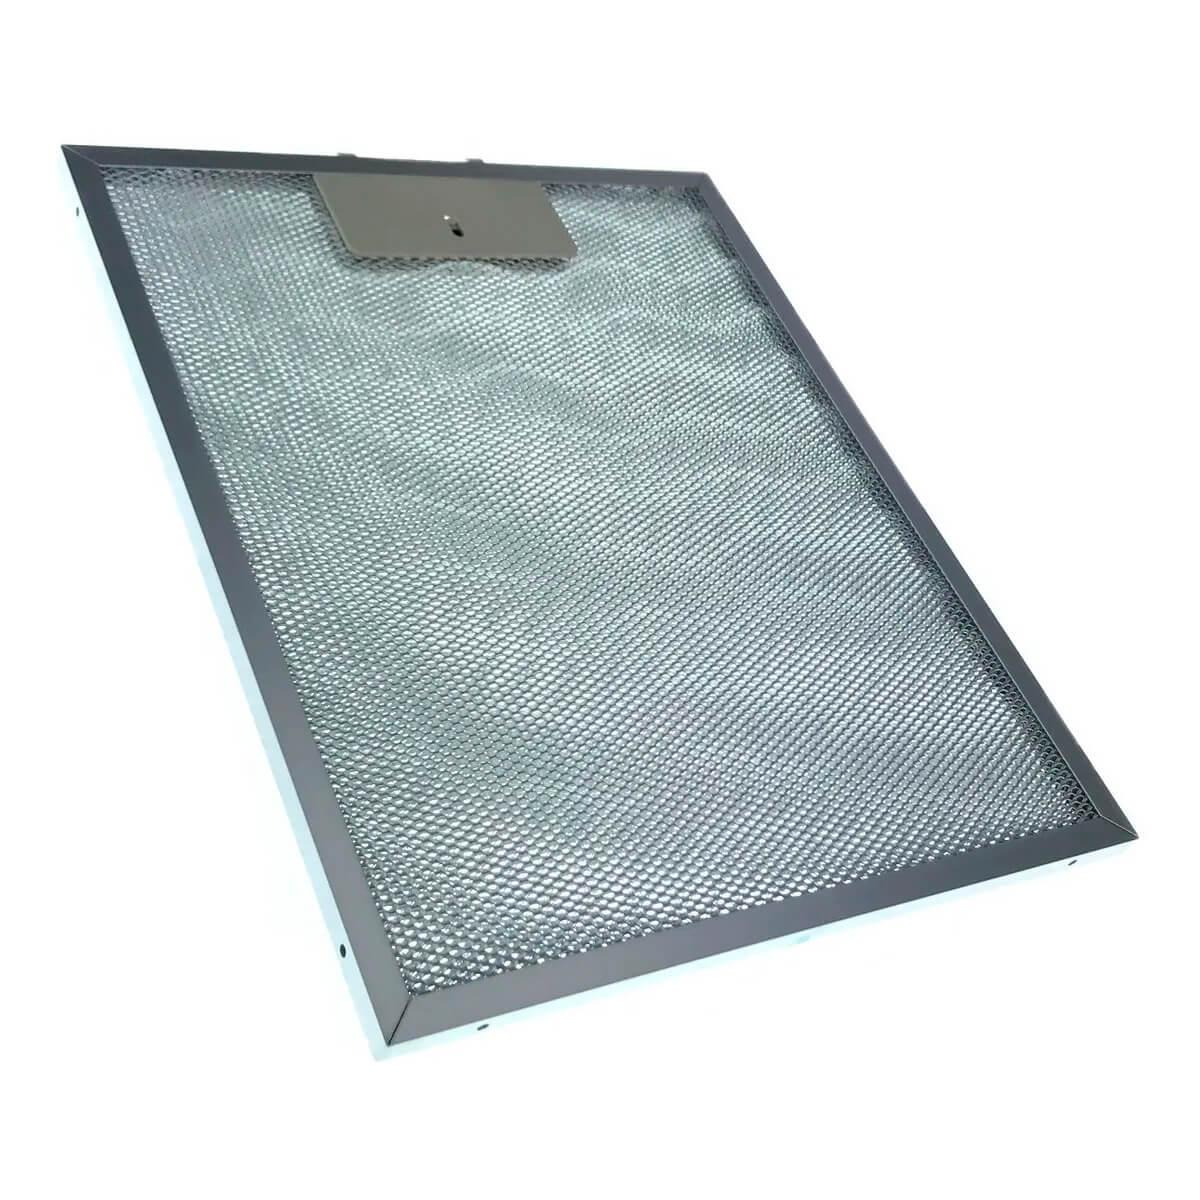 Kit Com 3 Filtros De Alumínio Para Coifa De Parede Electrolux - A13543601